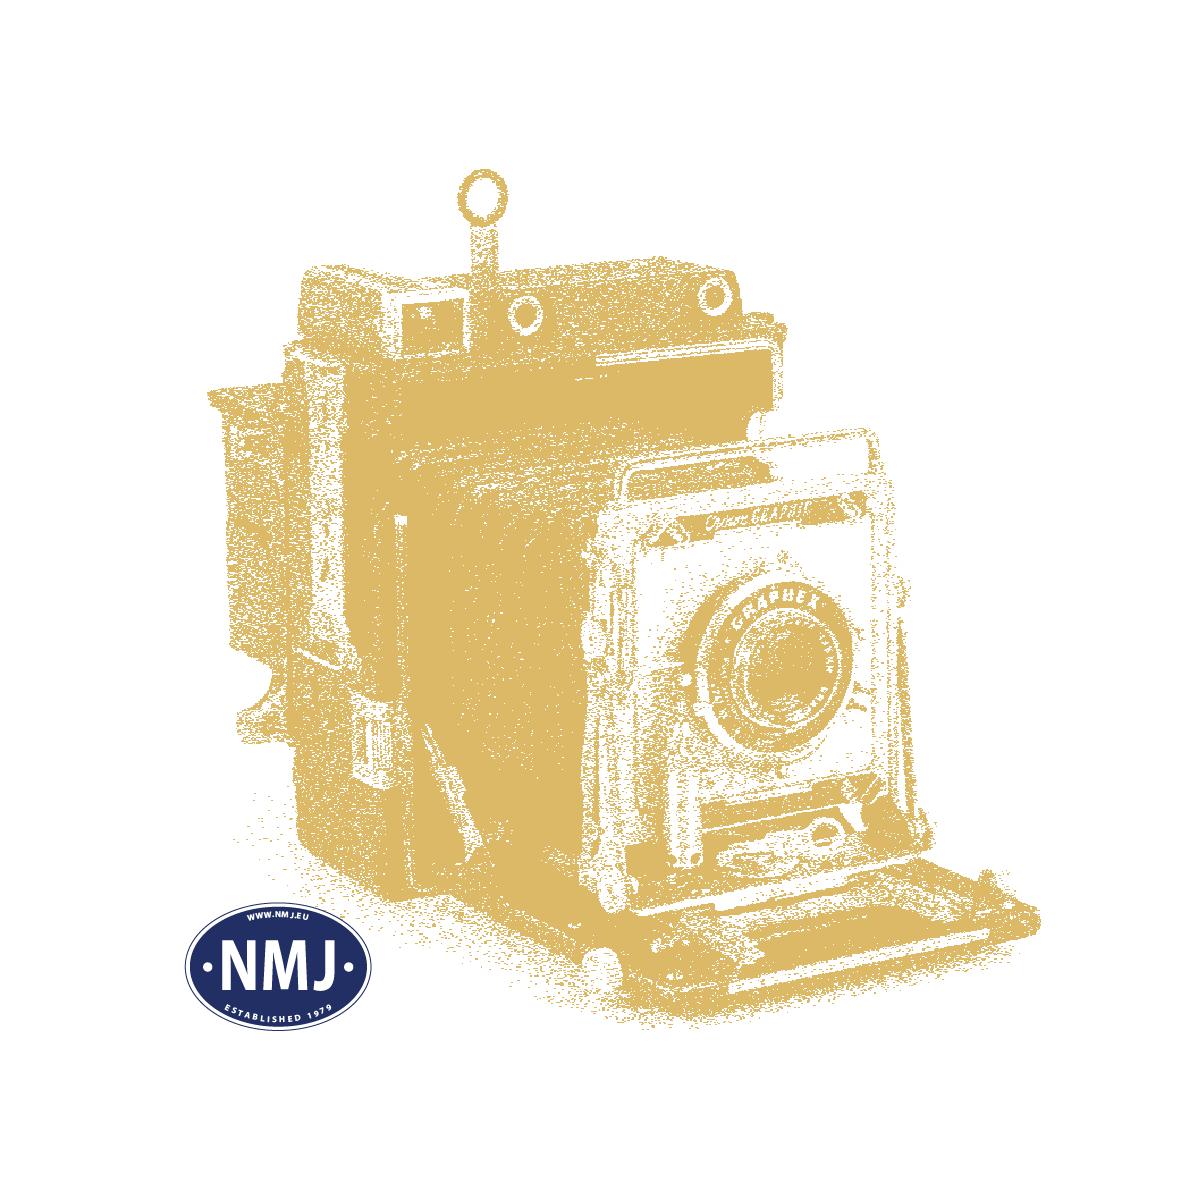 NMJB1136 - Canon CN-22, Svinghjul x 2, Kardanoverføring x 2, DC motor